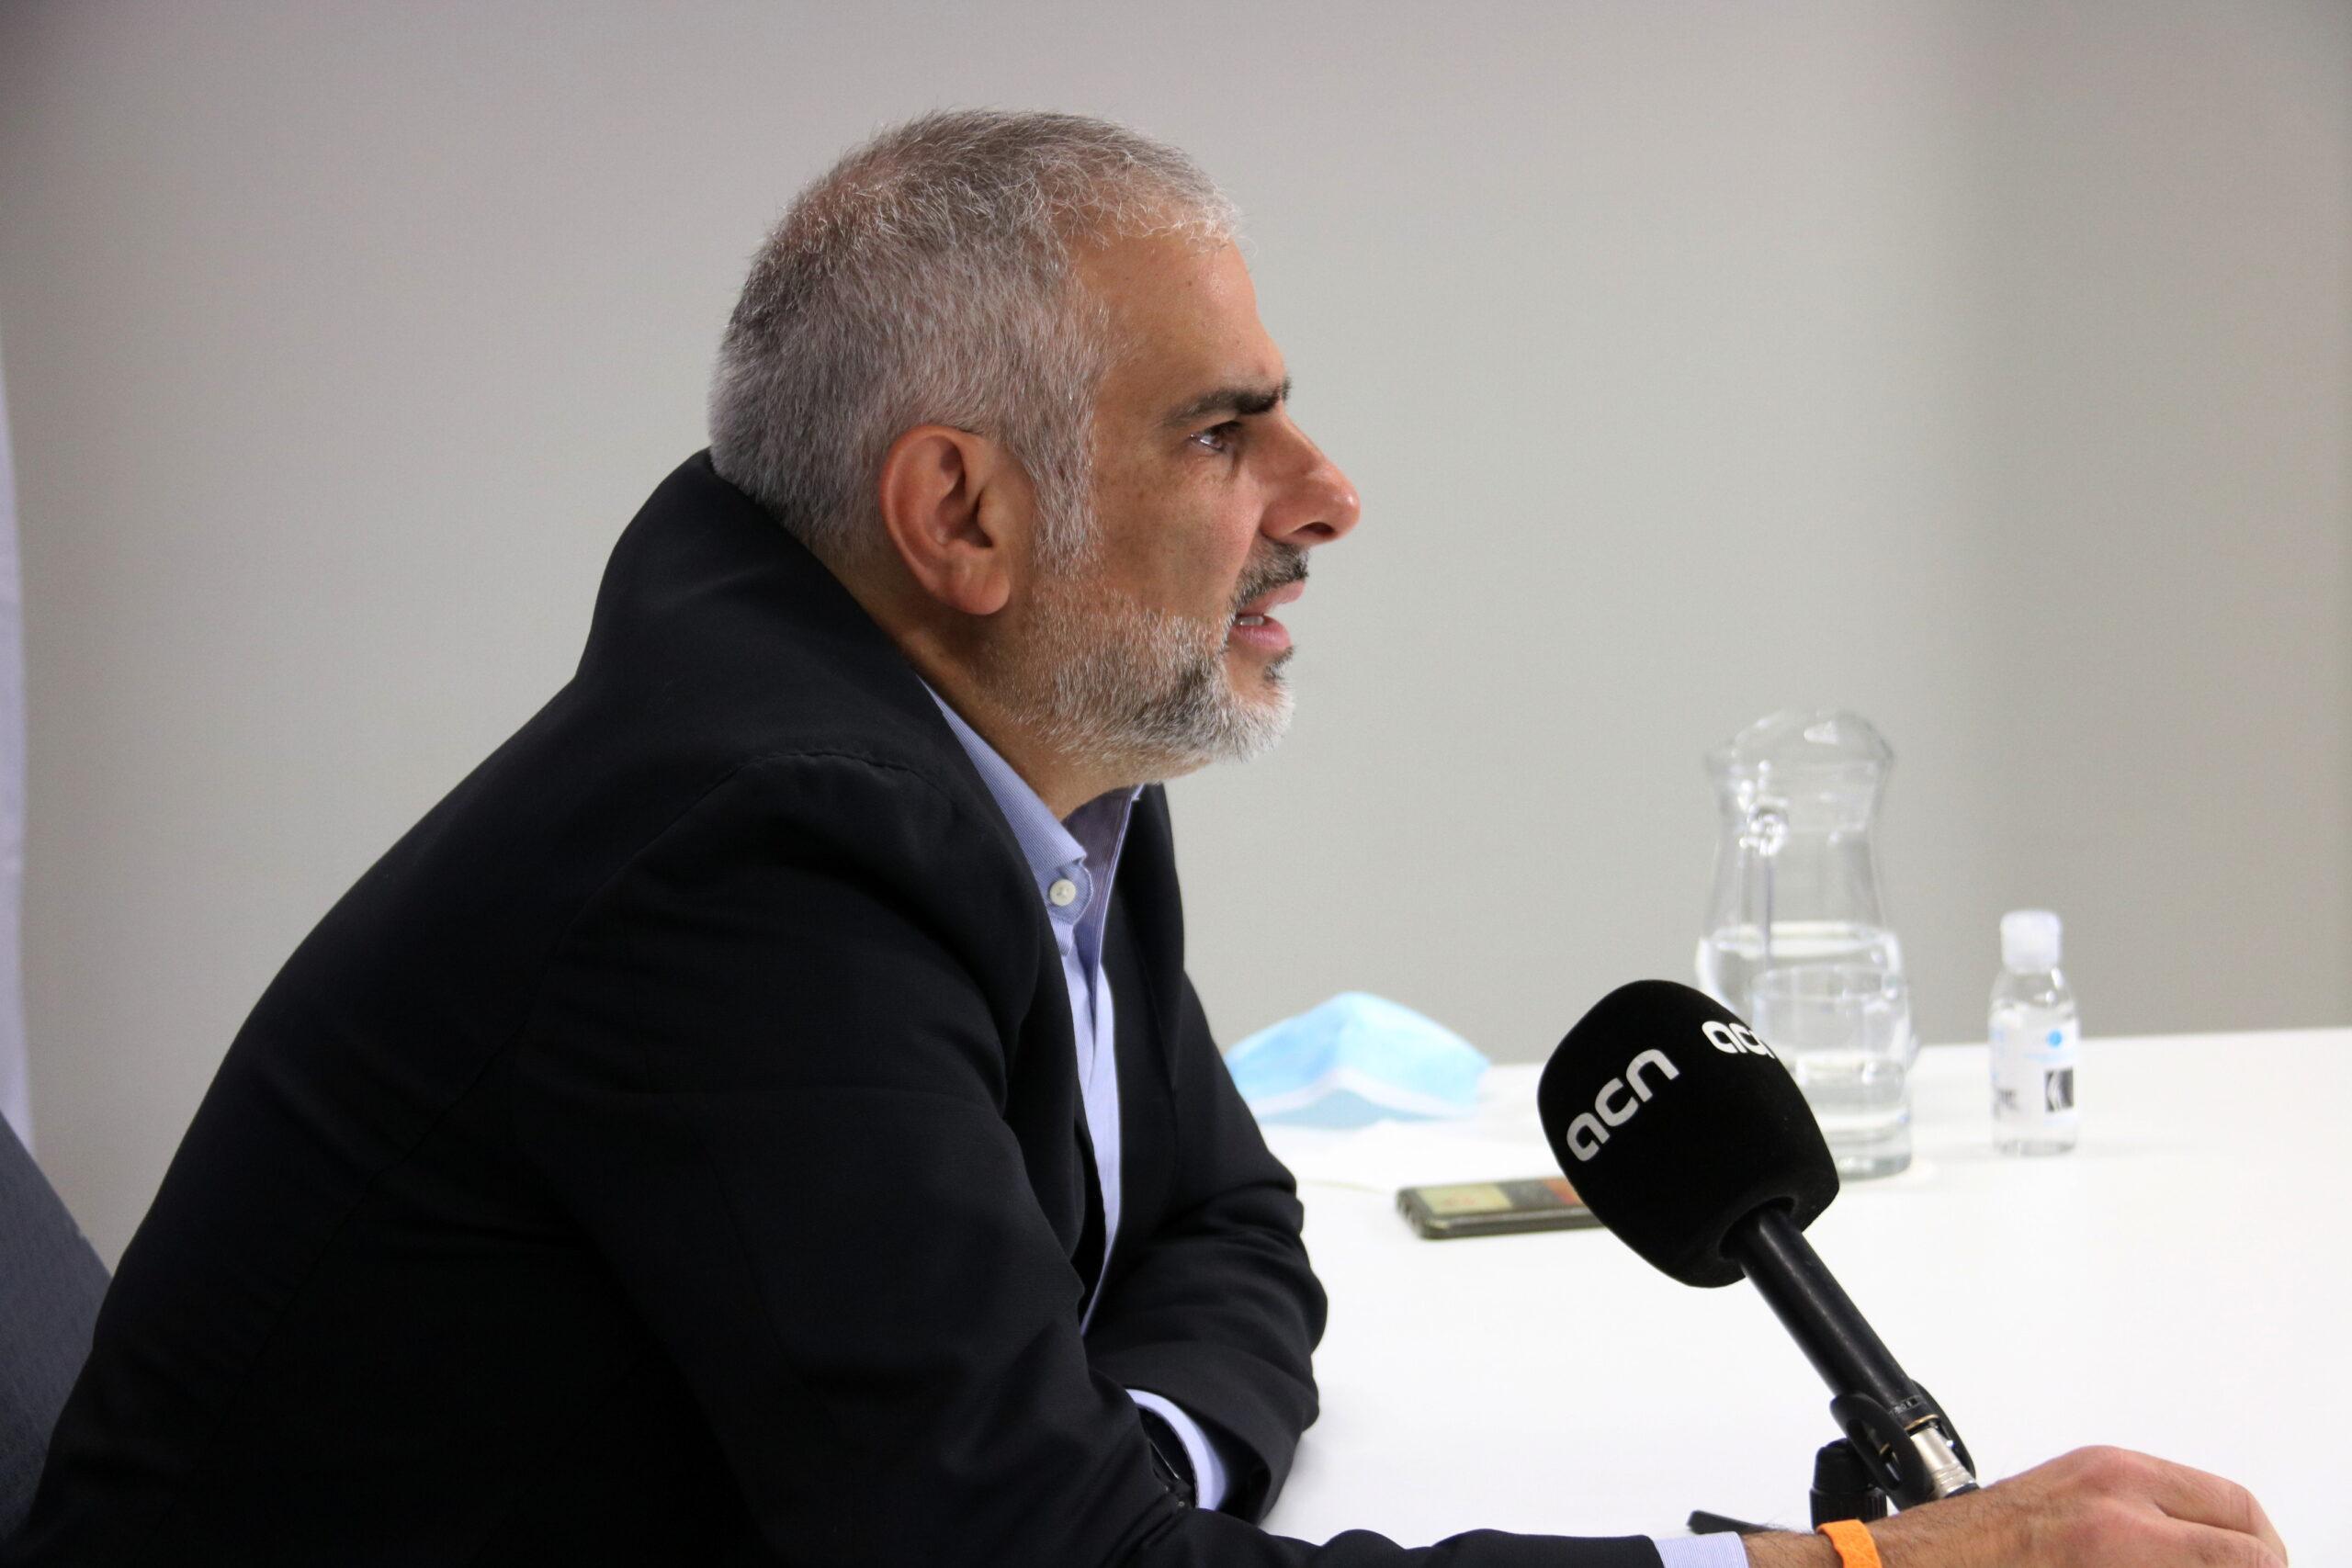 El president del grup parlamentari de Ciutadans, Carlos Carrizosa | ACN